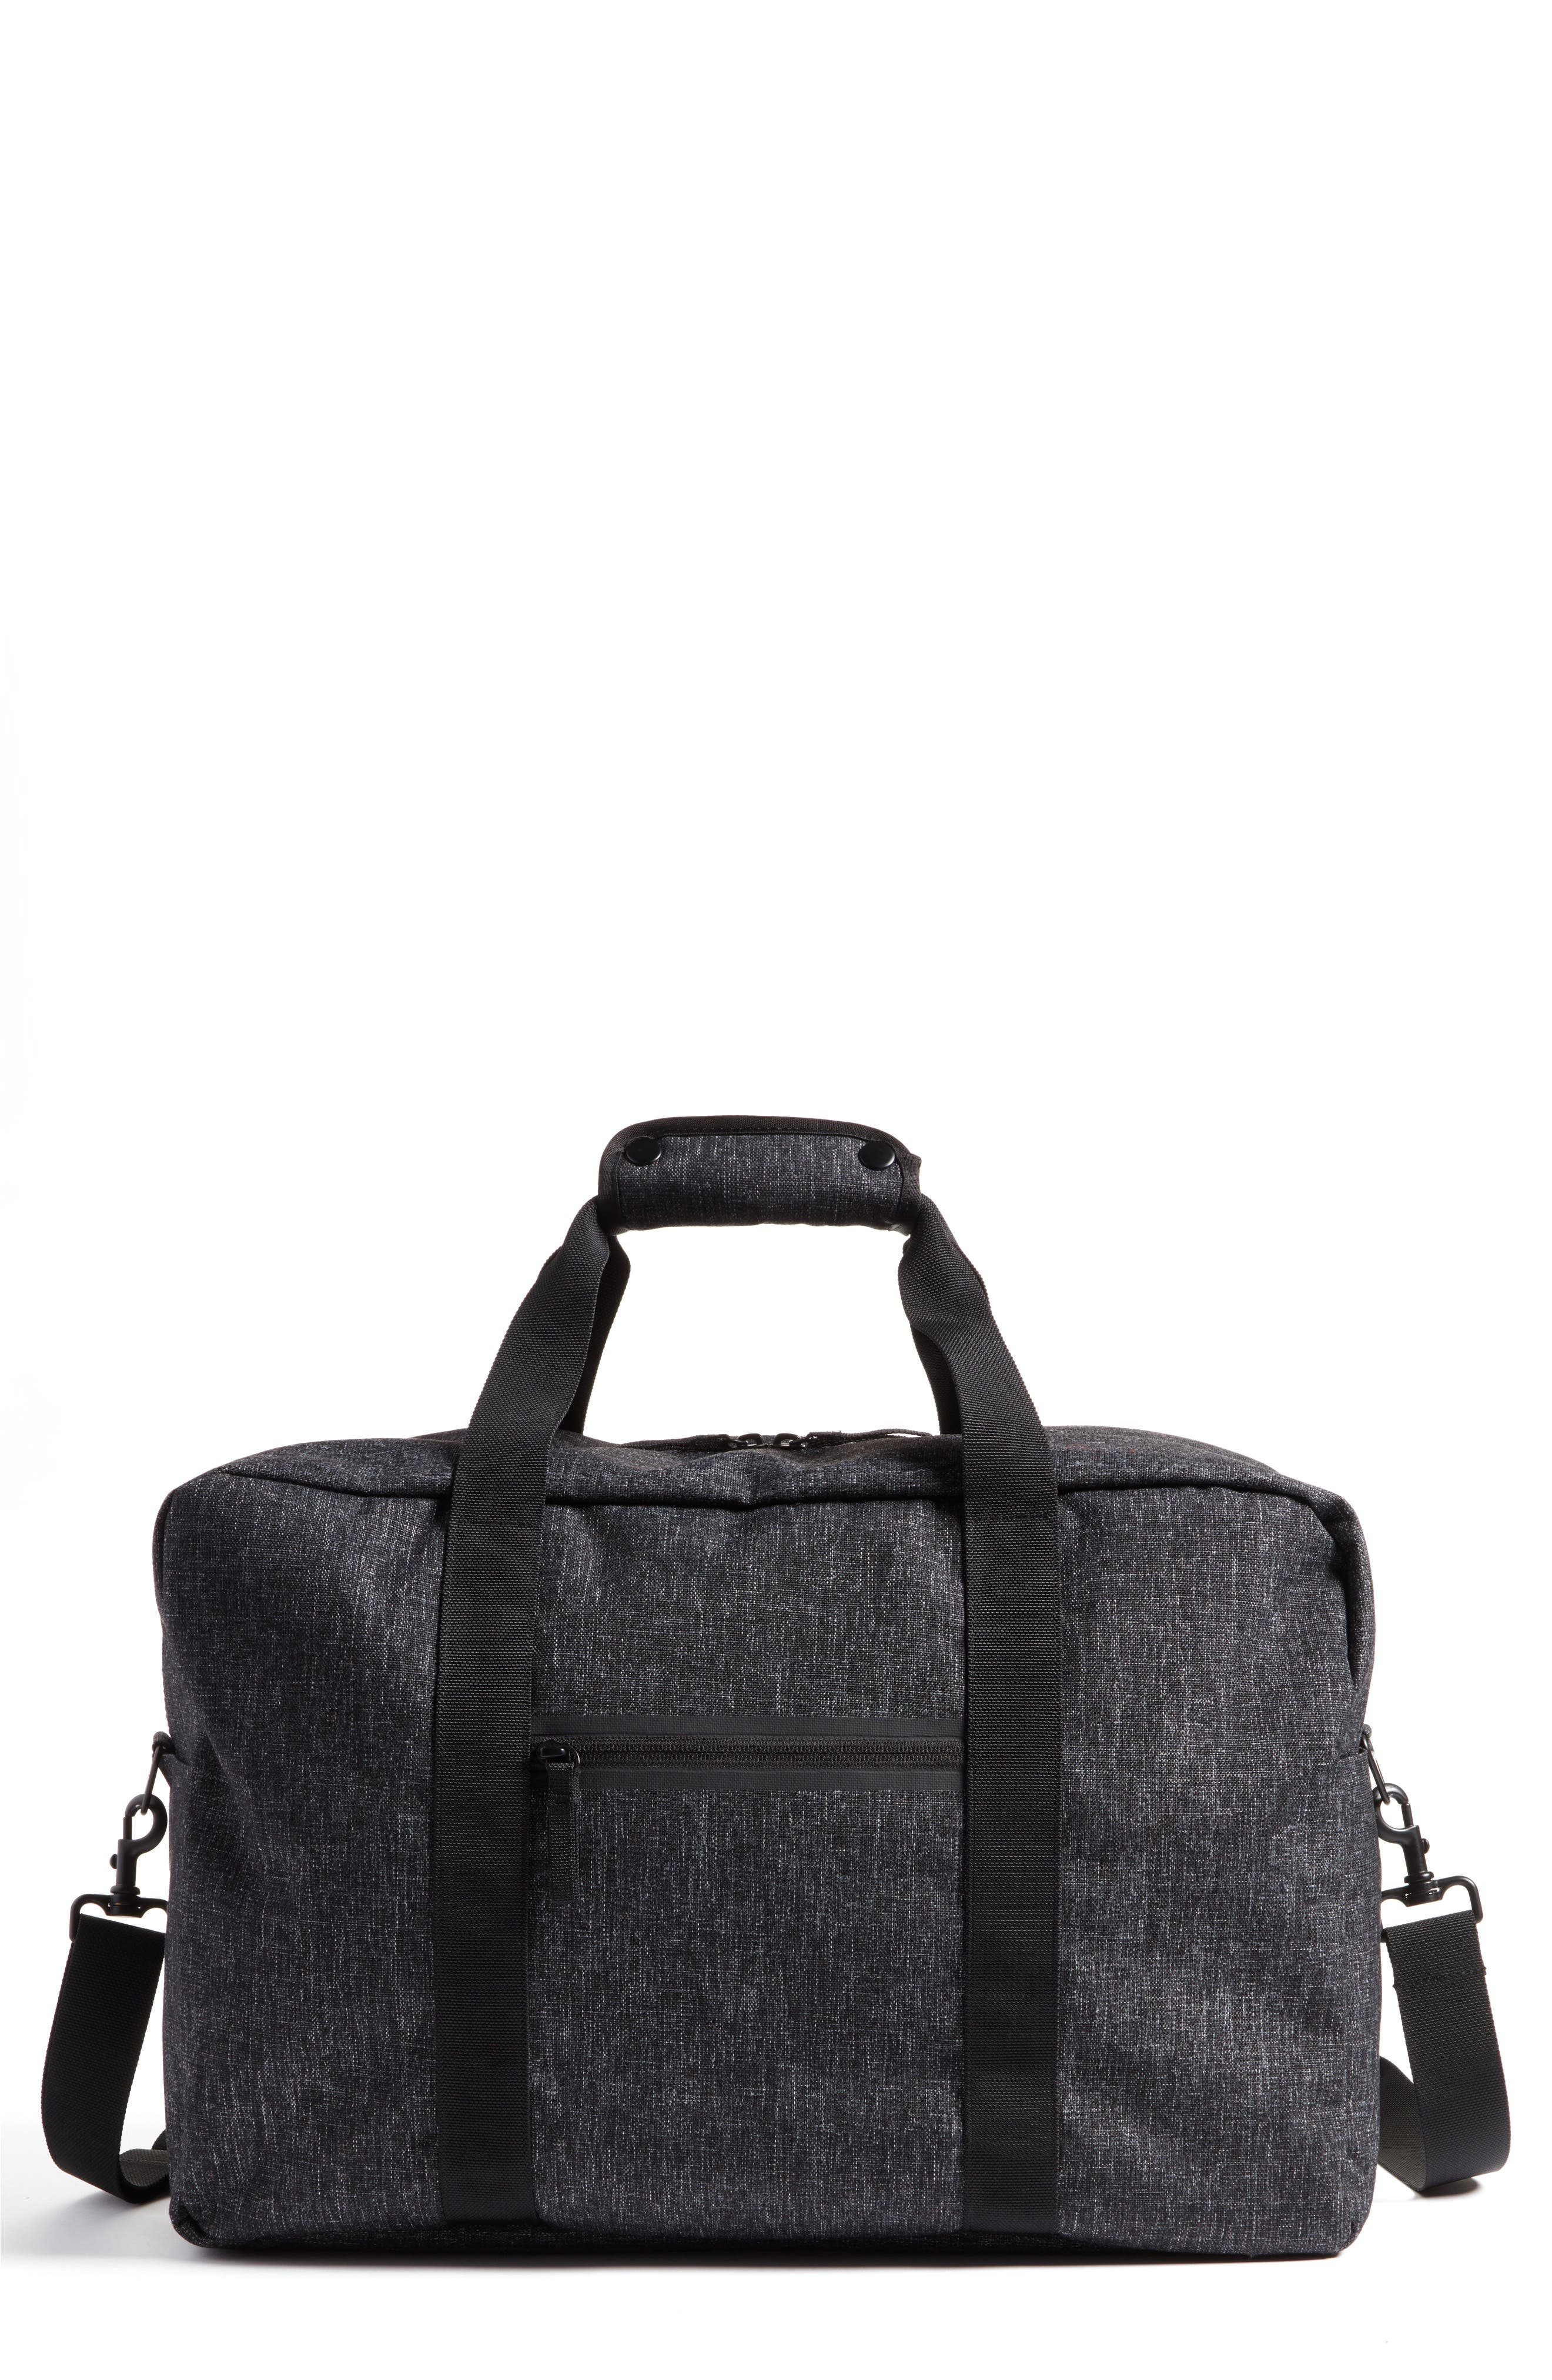 Everlane The Nylon Weekend Bag